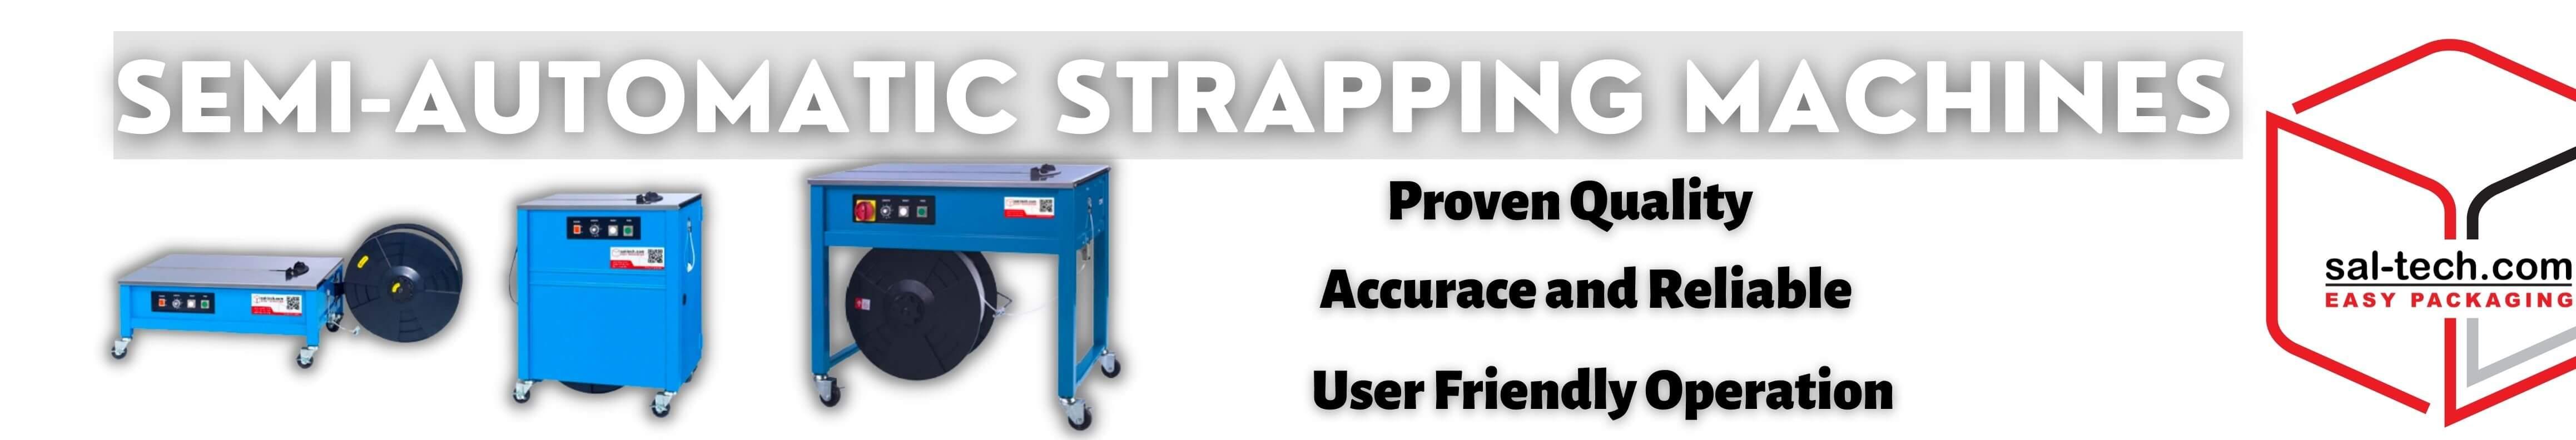 SEMI-AUTOMATIC STRAPPING MACHINES